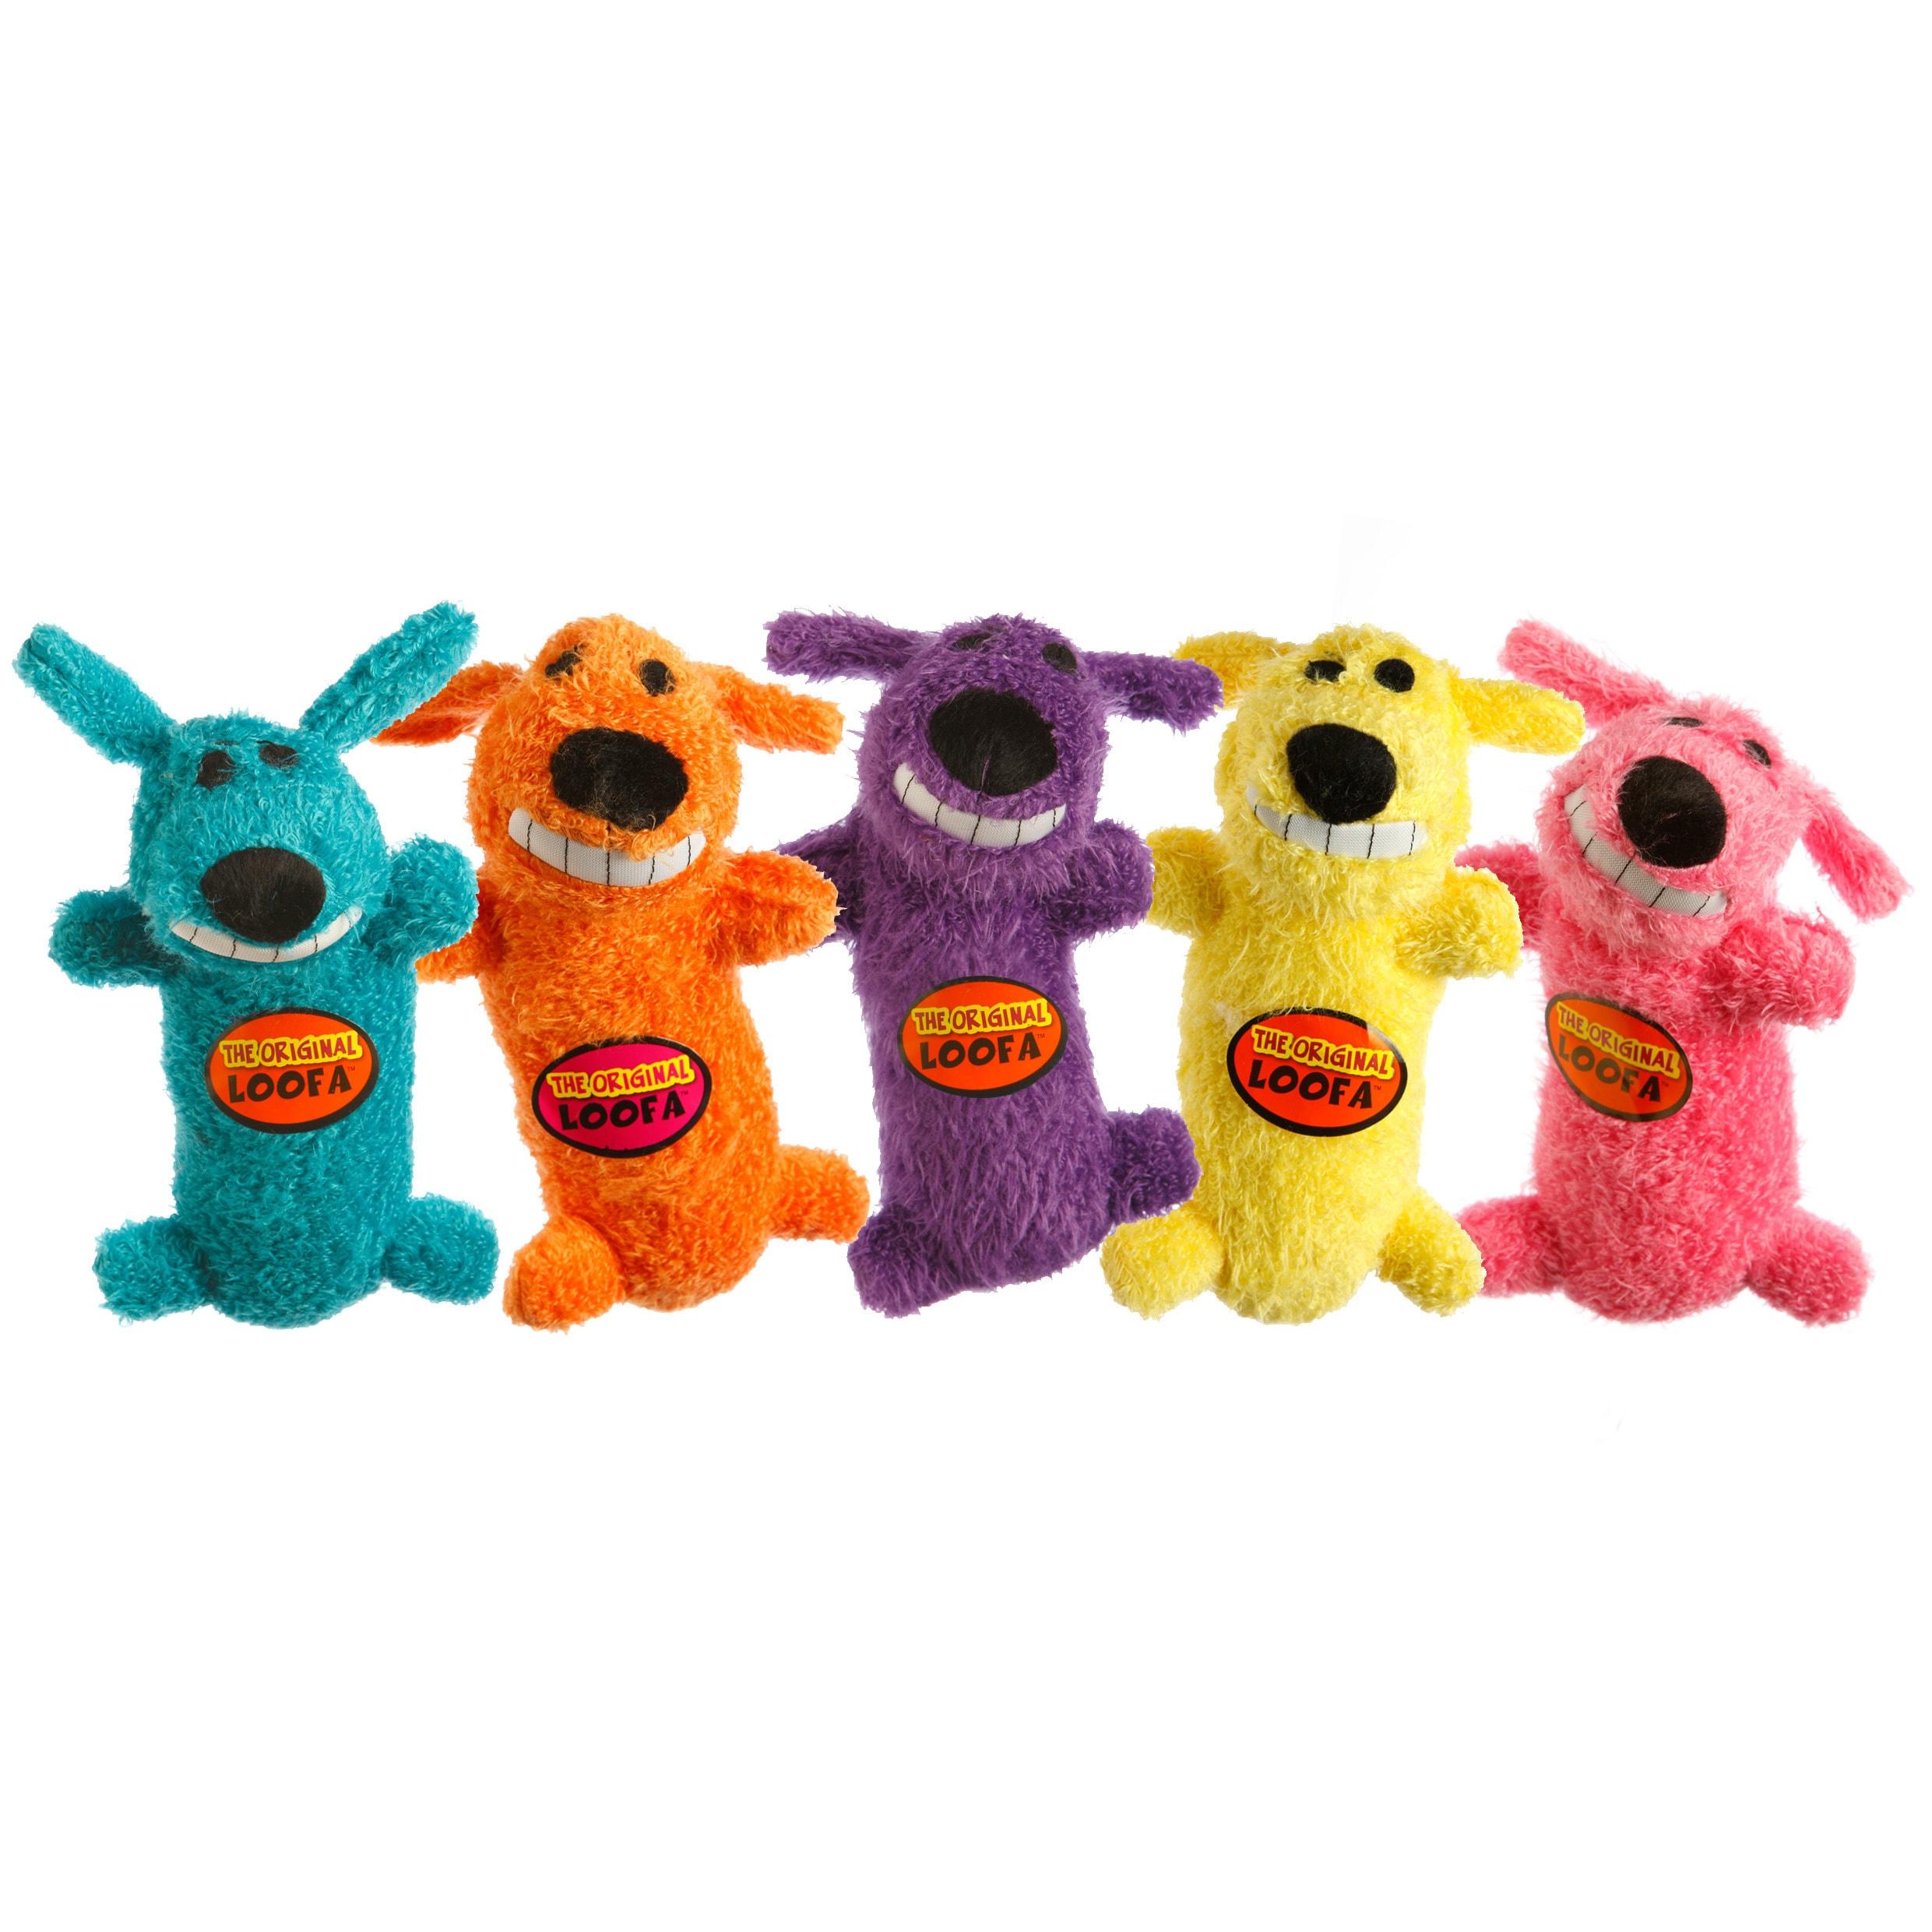 Multipet Loofa Dog 6-inch Mini Assorted Colors (7-84369-4...